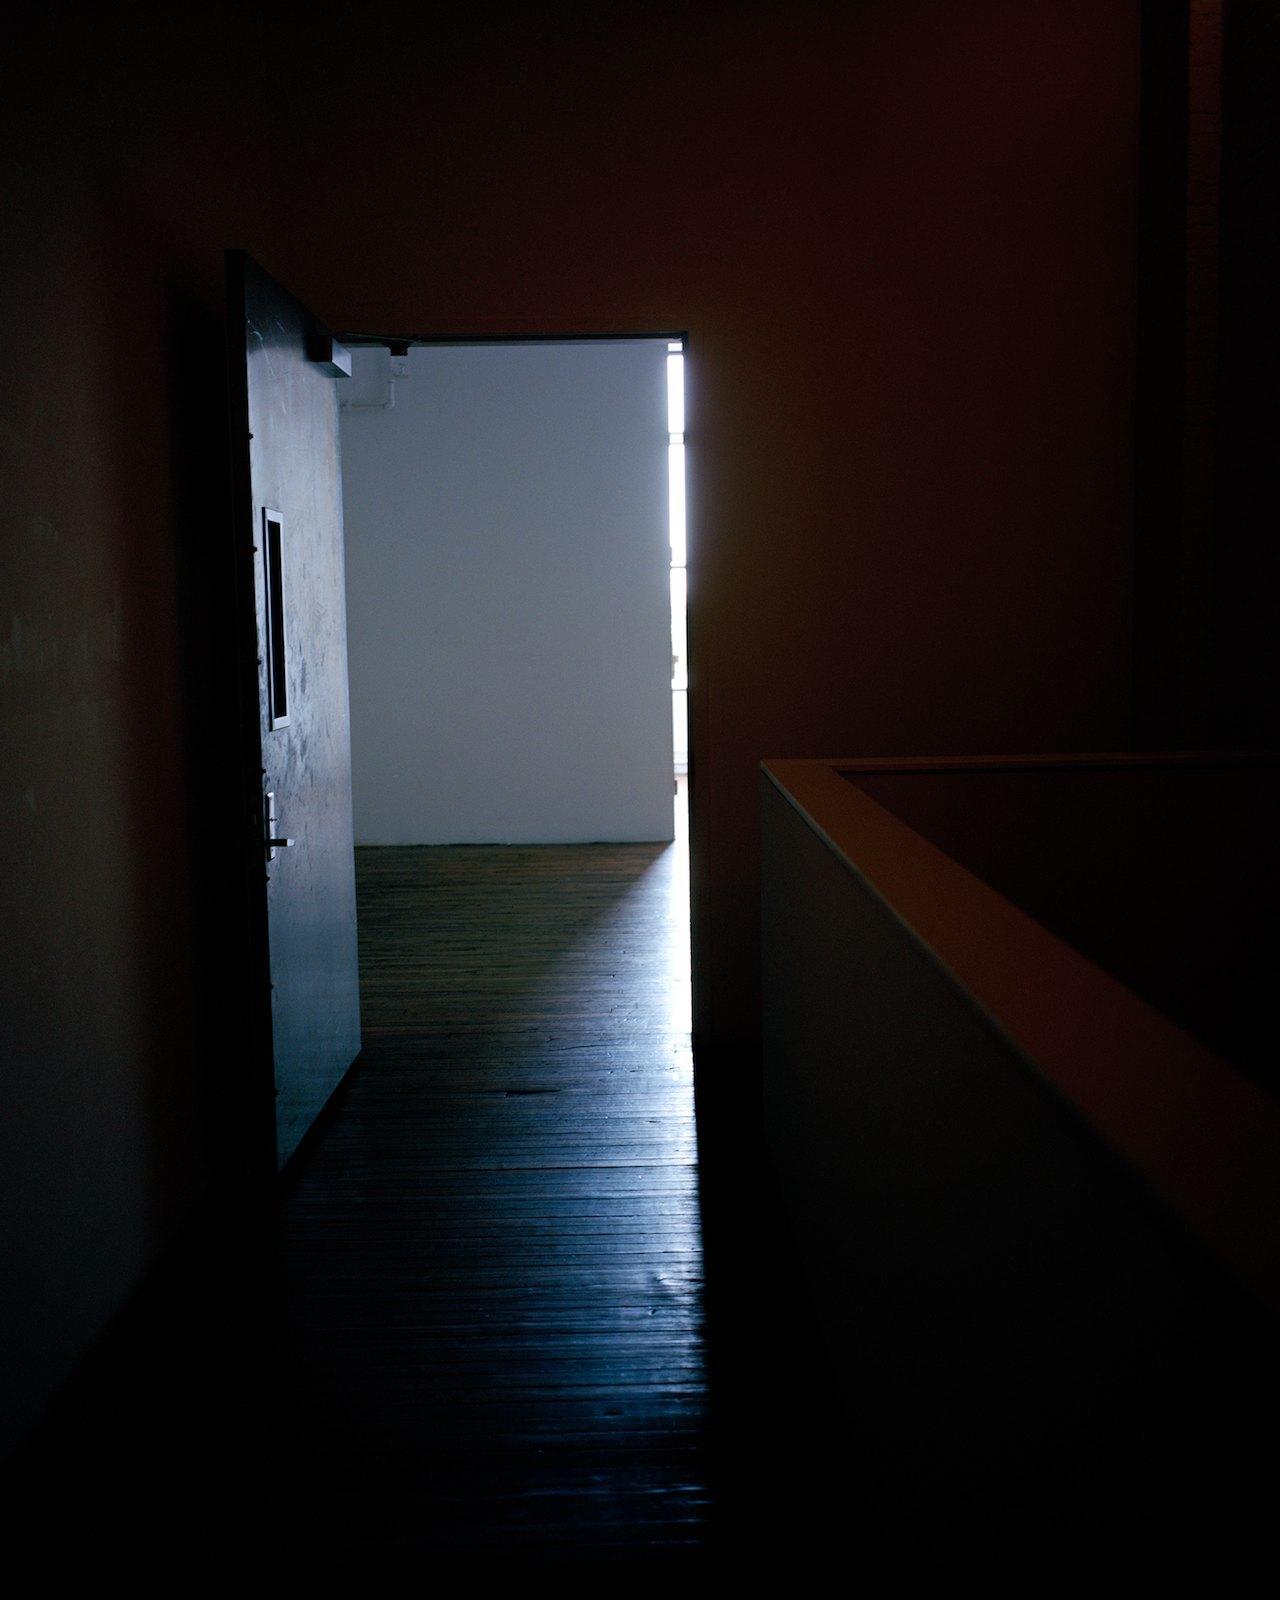 Doorway I, 2014, c-print, 60 x 48 cm, ed. 5